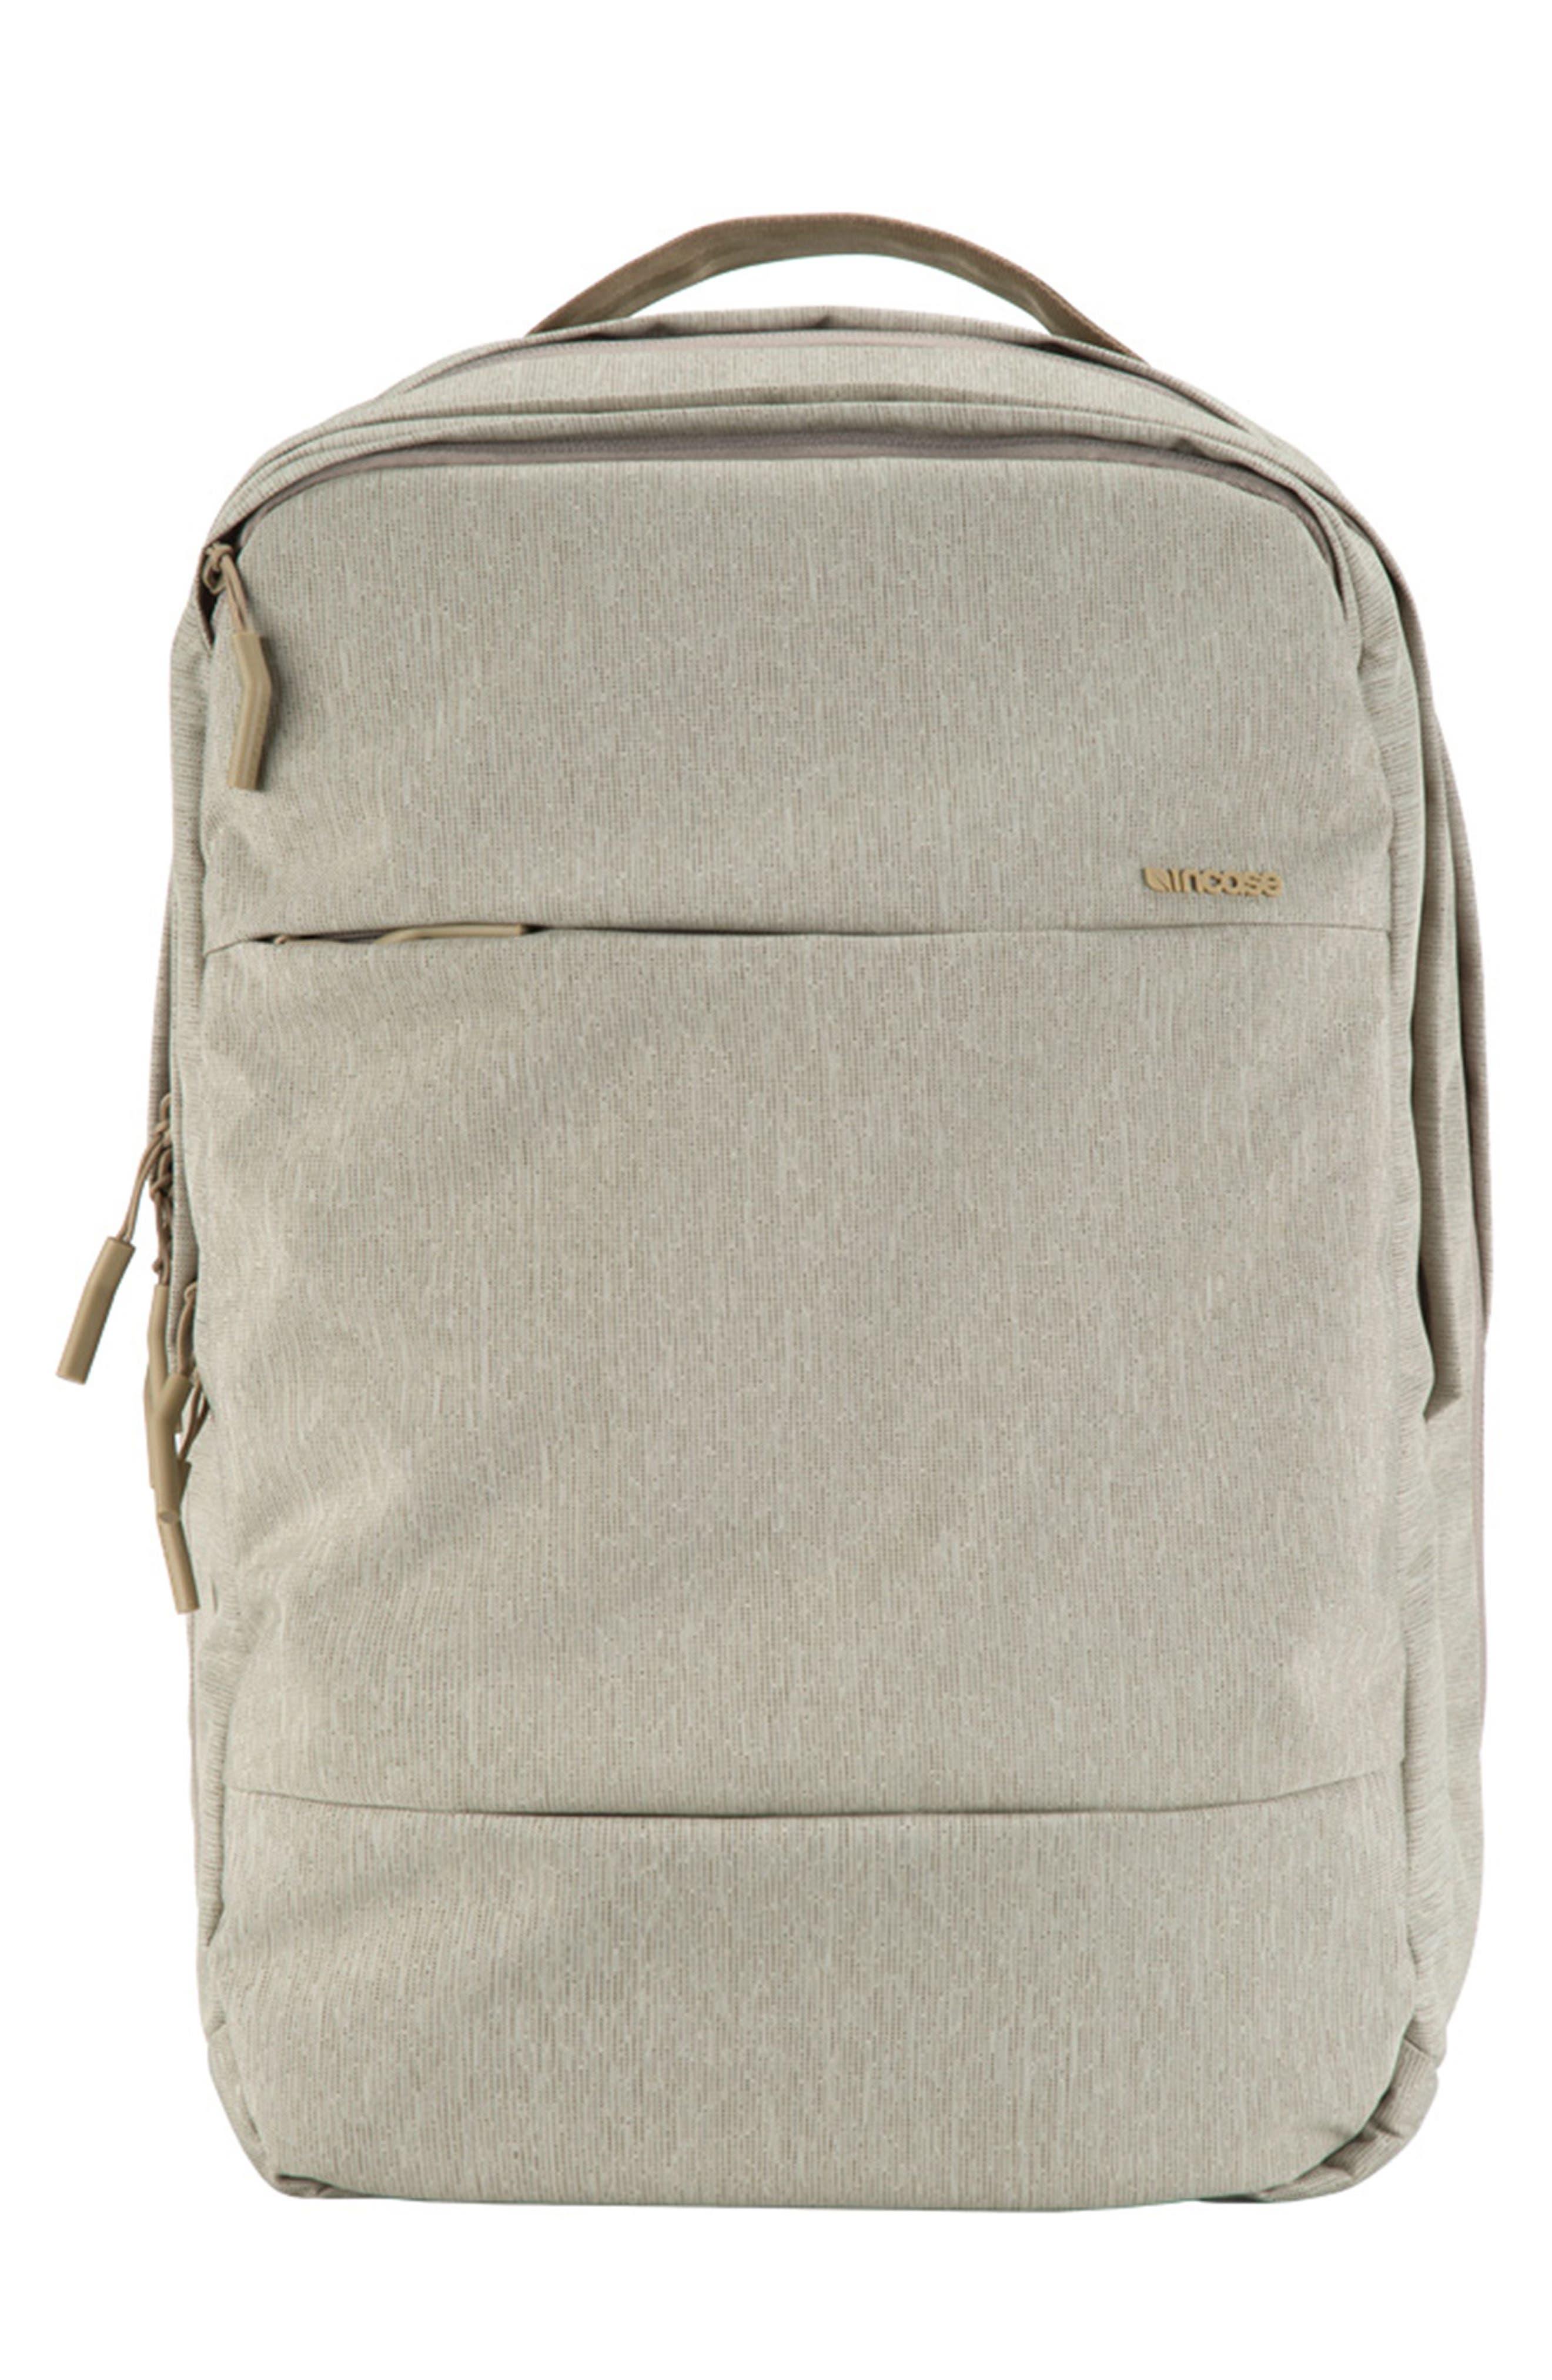 Alternate Image 1 Selected - Incase Designs City Commuter Backpack